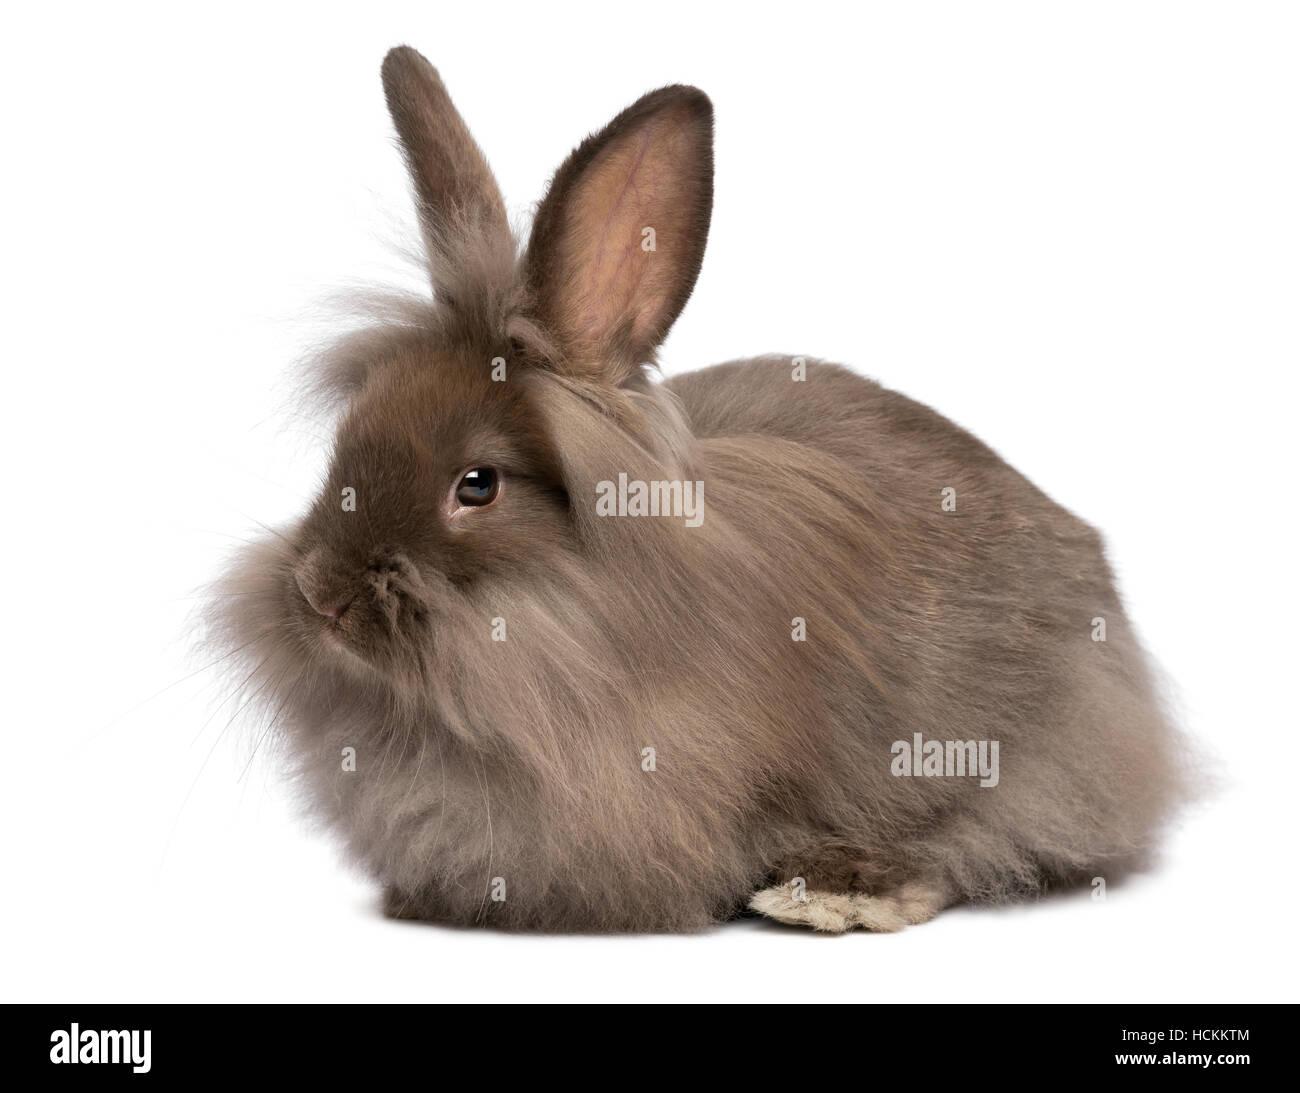 Cute lying chocolate colored mini lionhead bunny rabbit - Stock Image